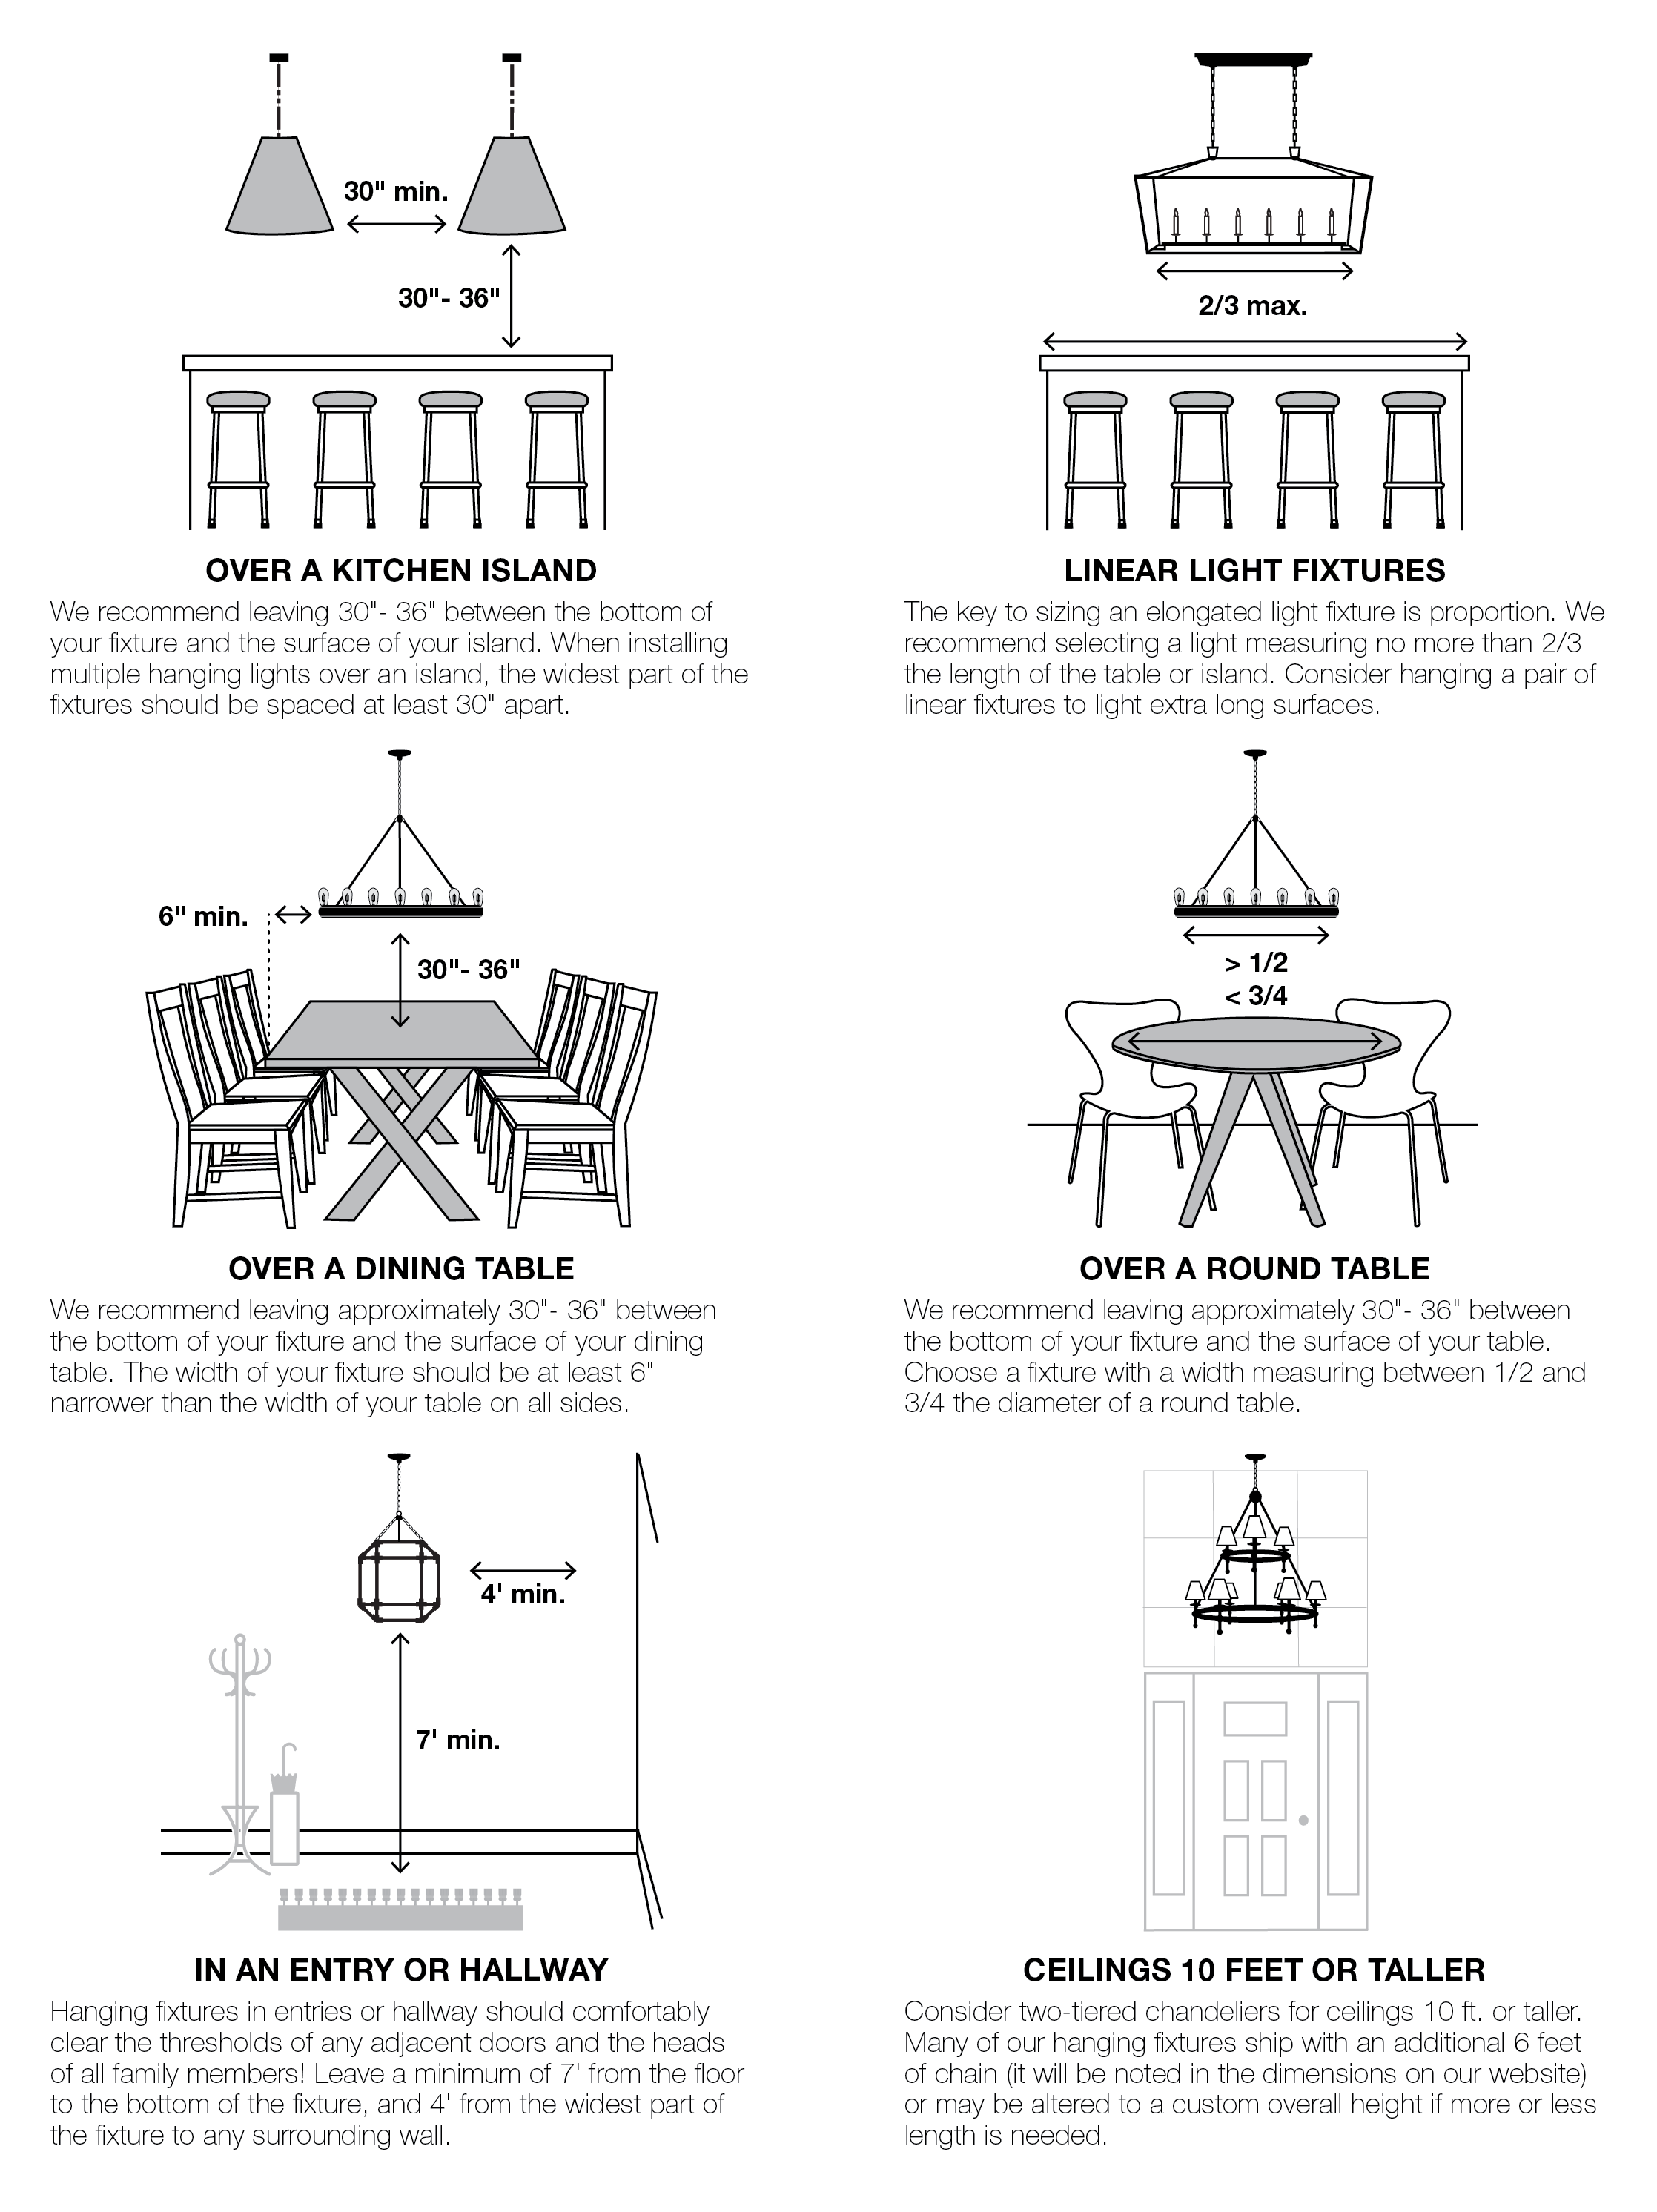 Ceiling Tips Lighting Guide Dining Table Lighting